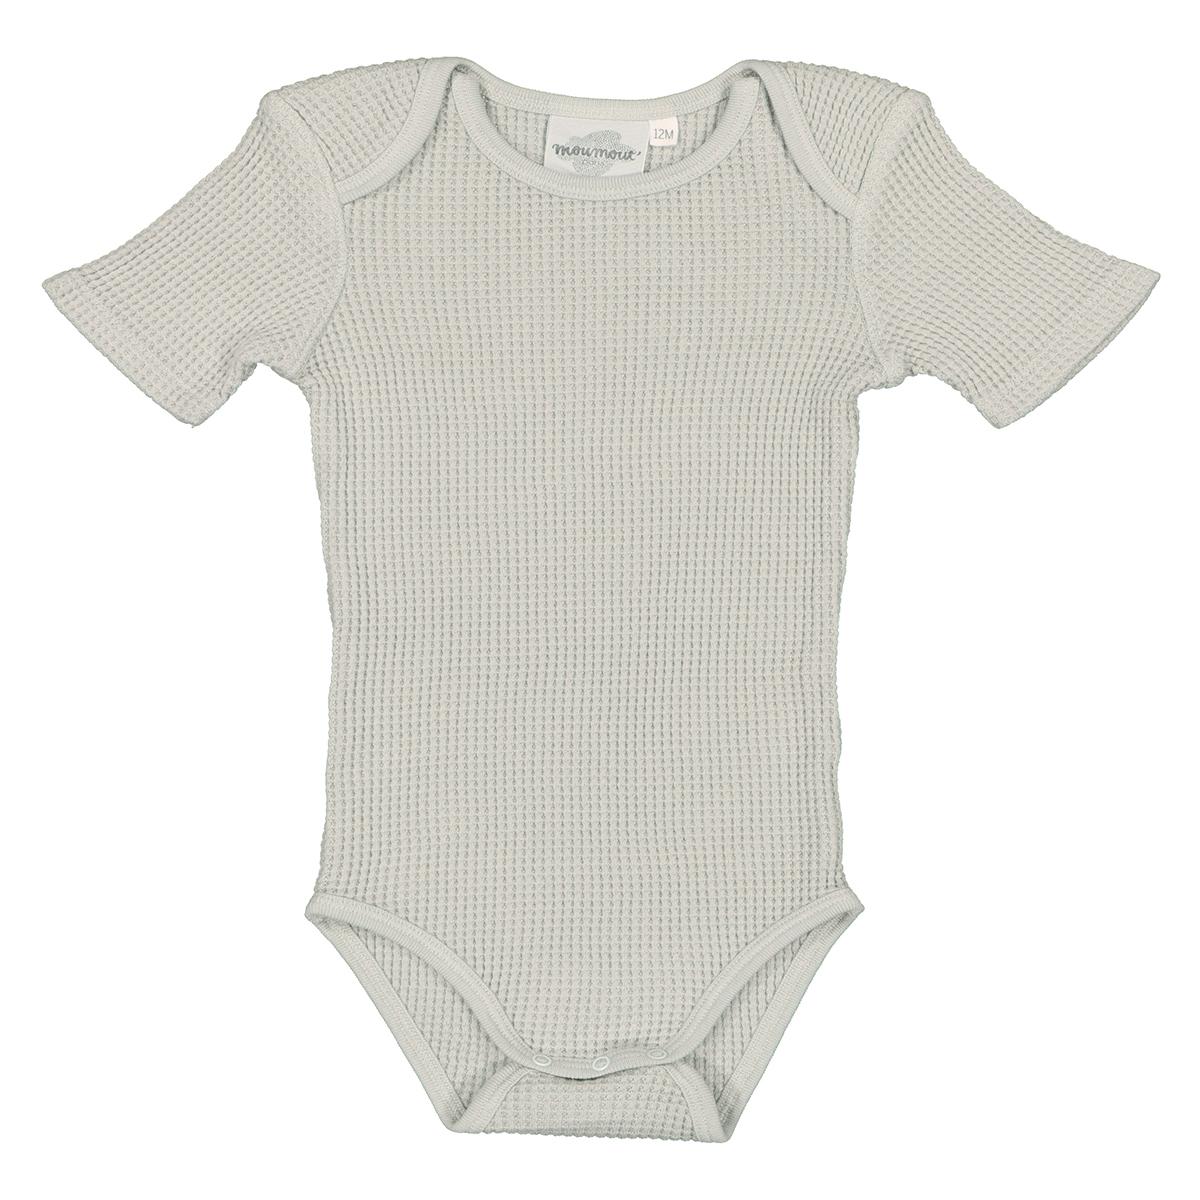 Body & Pyjama Body Raymond Bee Amande - 18 Mois Body Raymond Bee Amande - 18 Mois